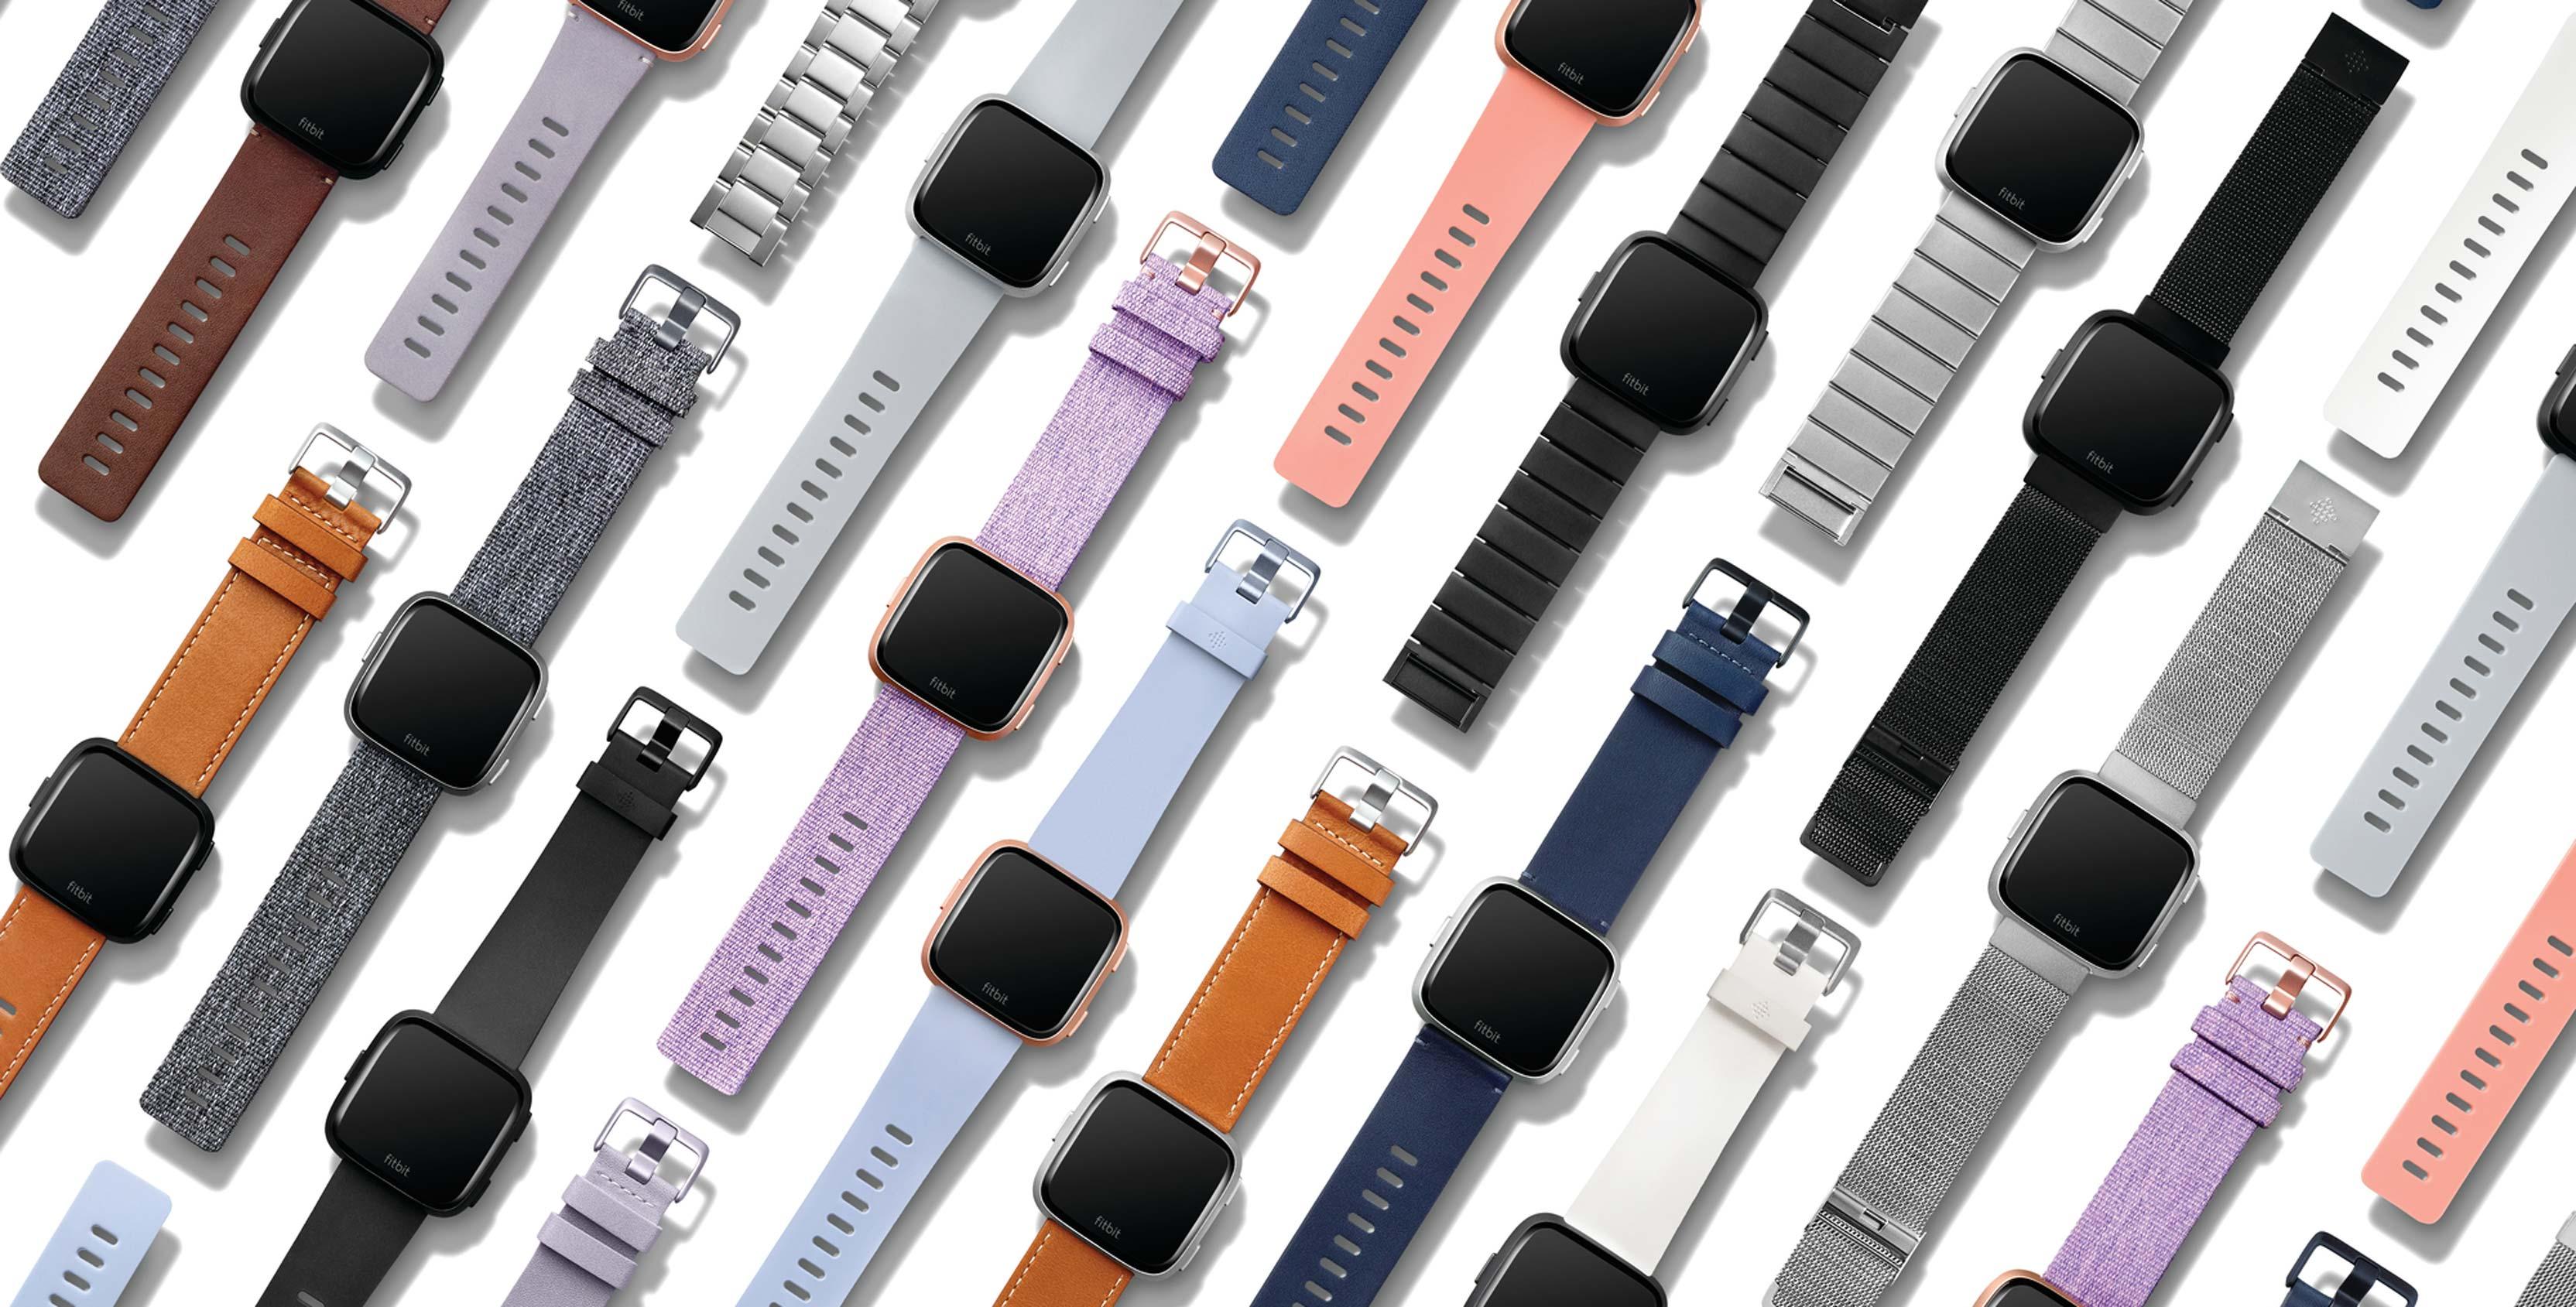 Fitbit's new Versa smartwatch family